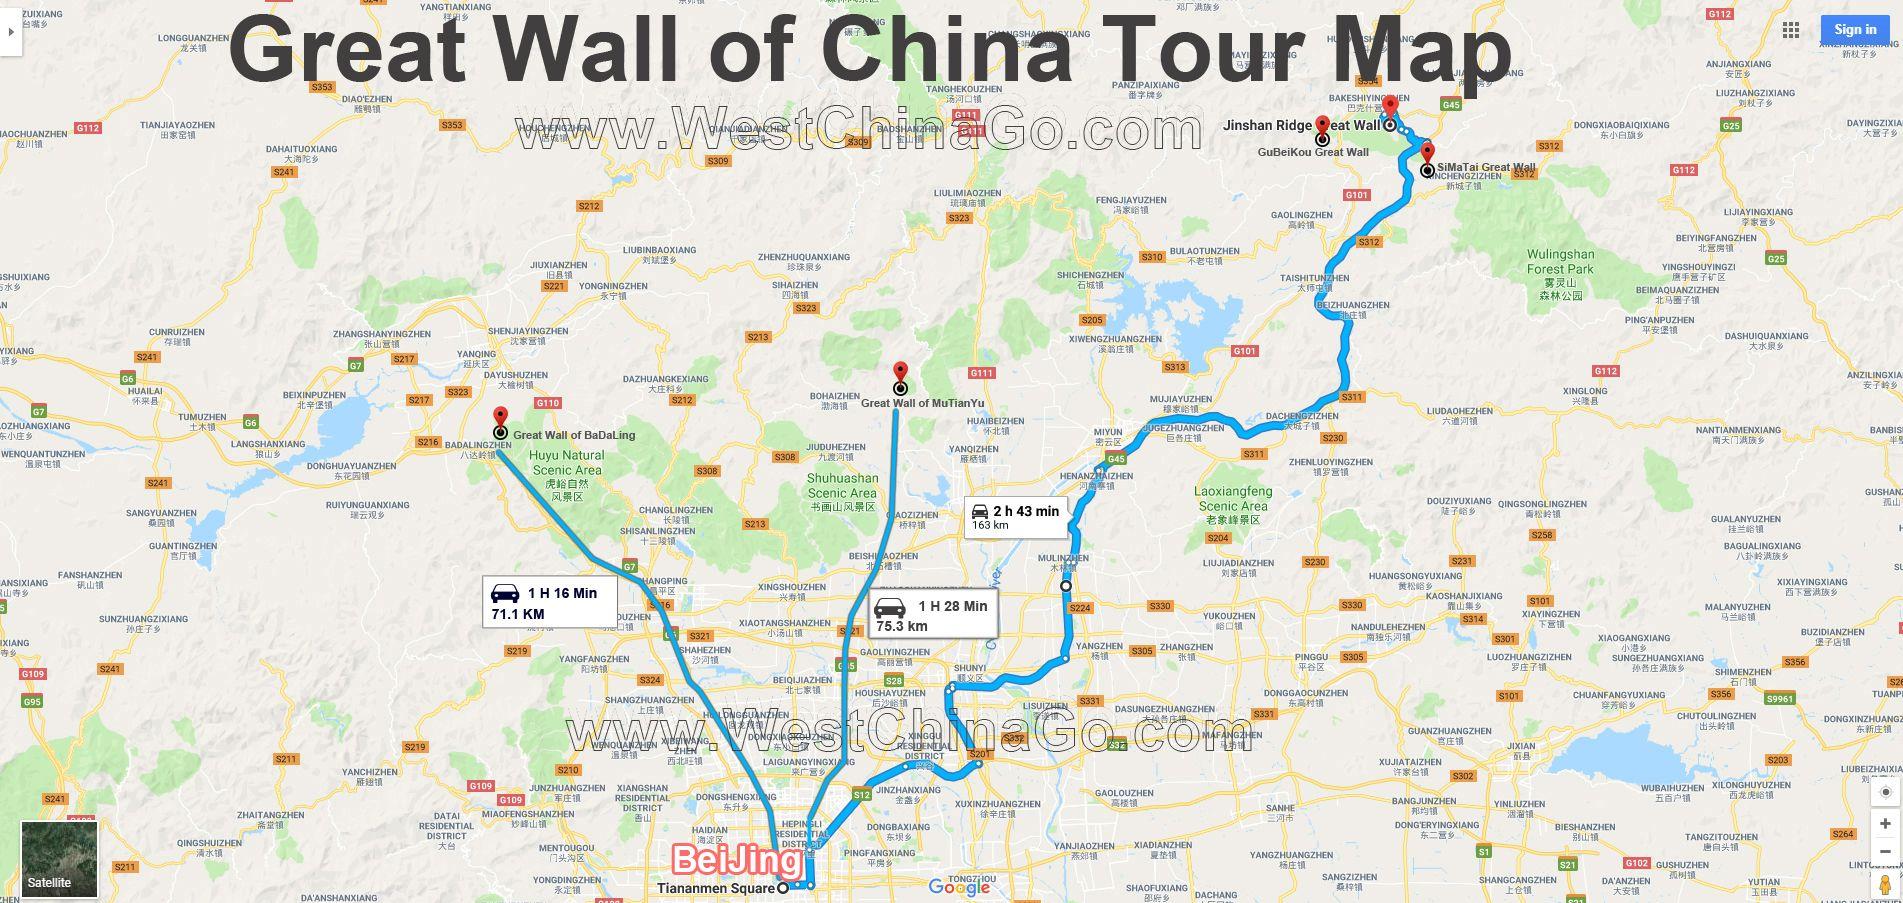 Great Wall of China Tourist Map ChengDu WestChinaGo Travel Service on